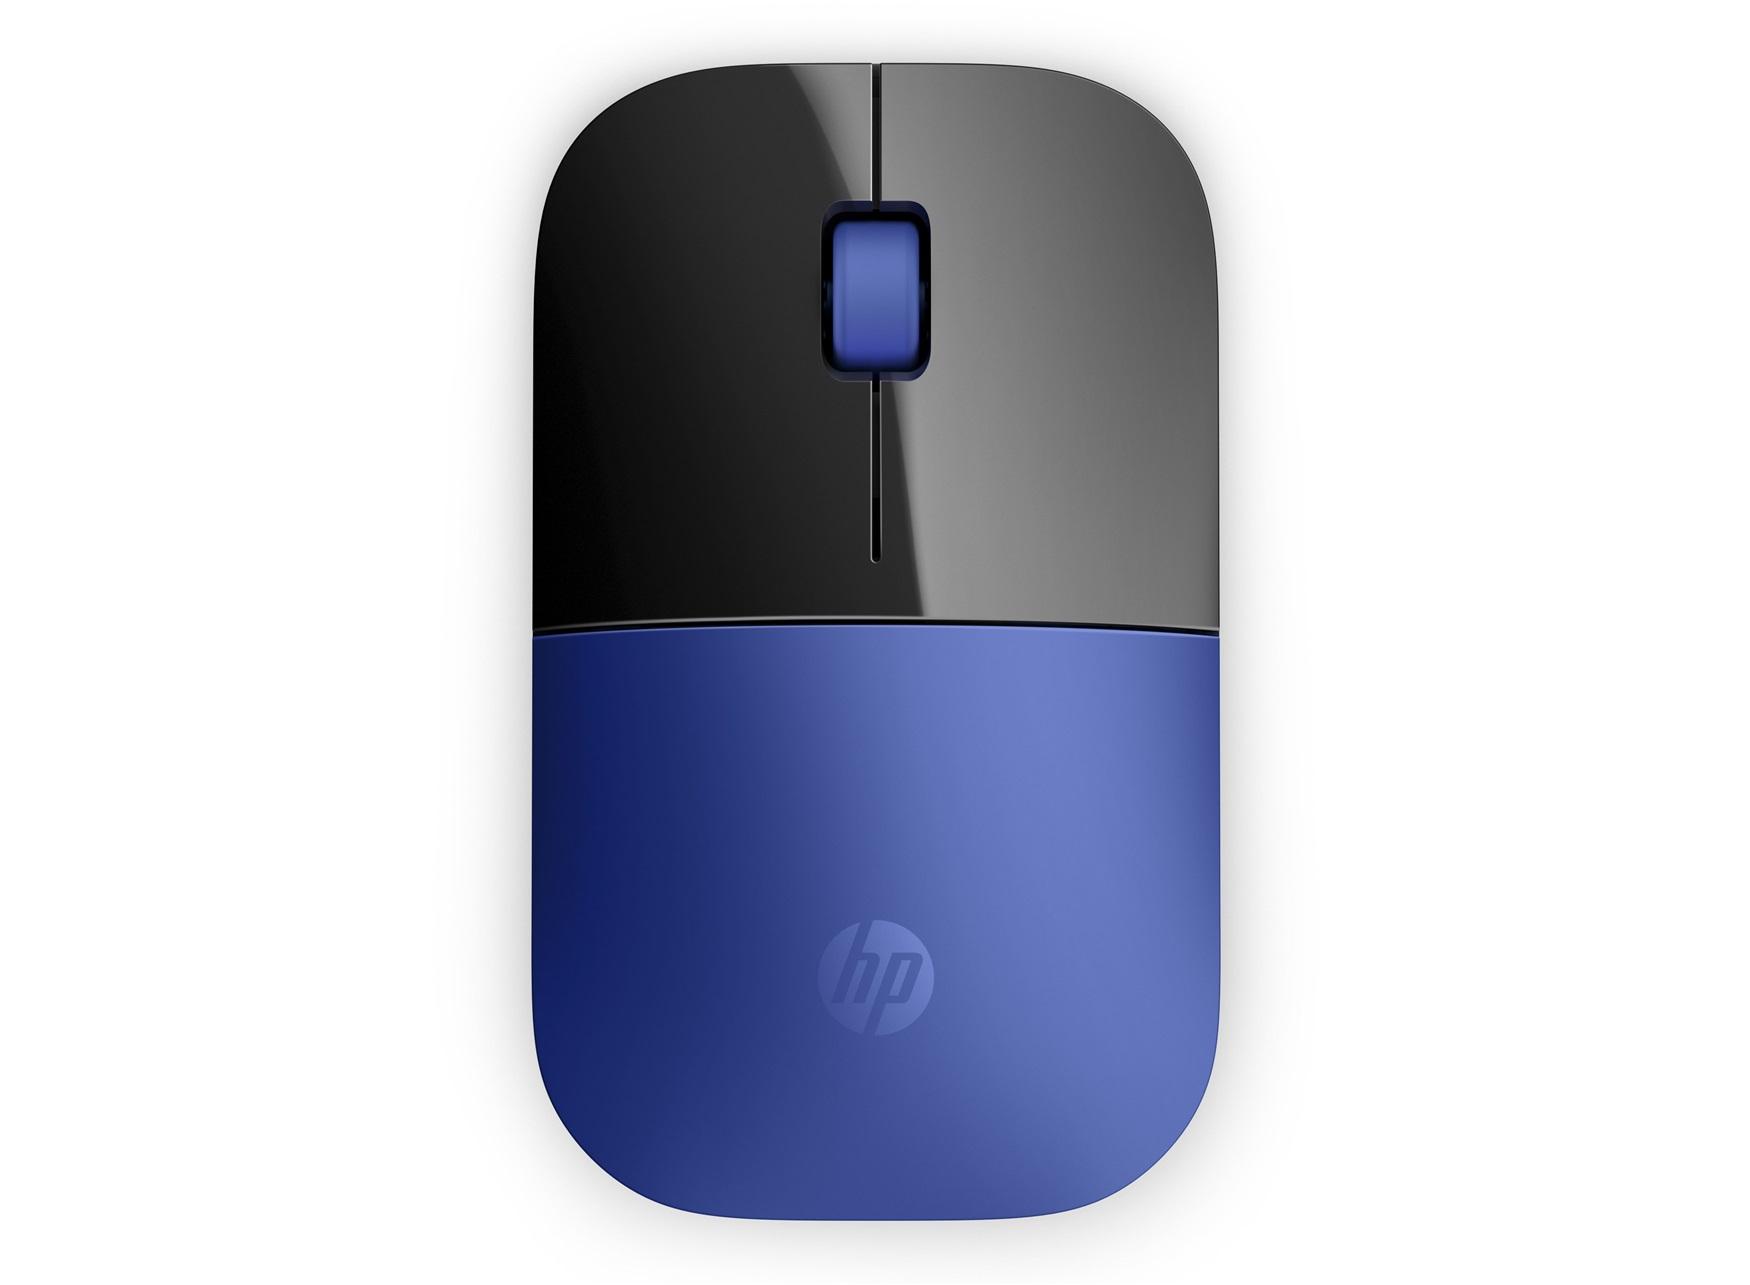 HP Z3700 RF Wireless Optical 1200DPI Black,Blue Ambidextrous